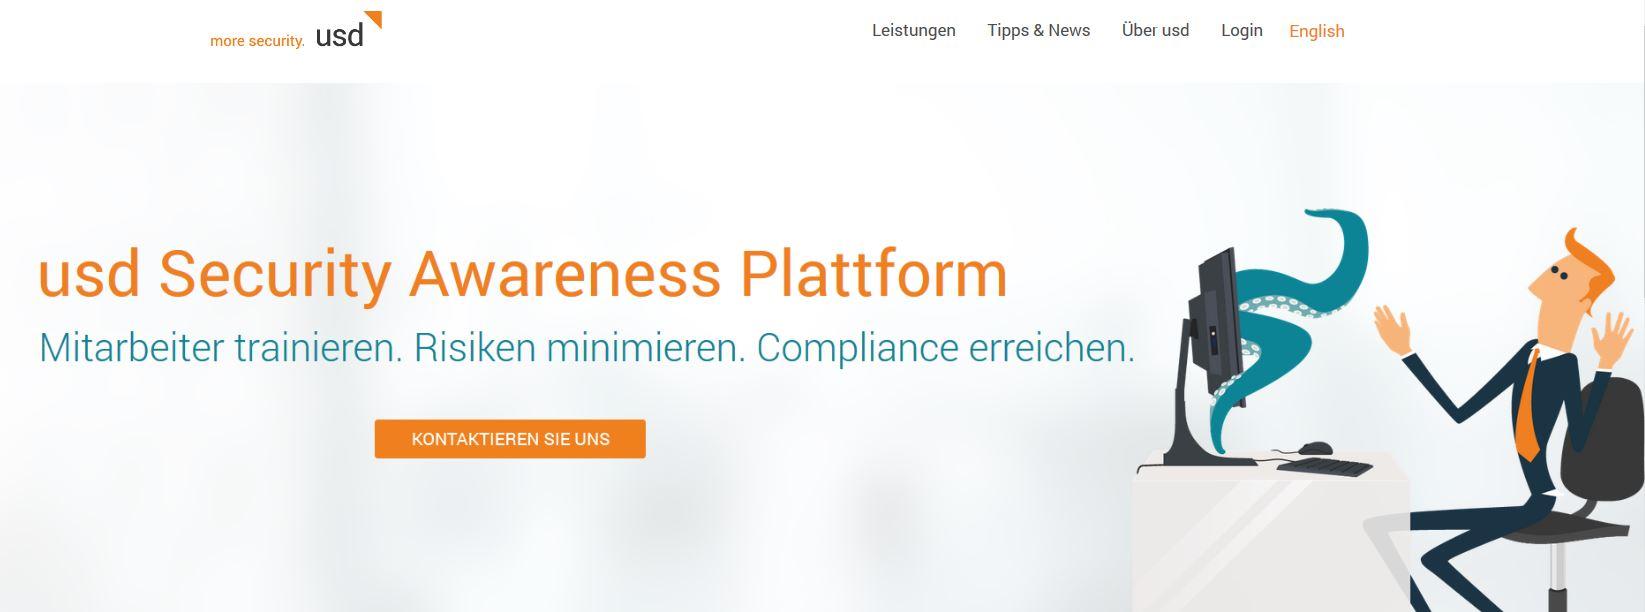 usd launcht neue Security Awareness Plattform